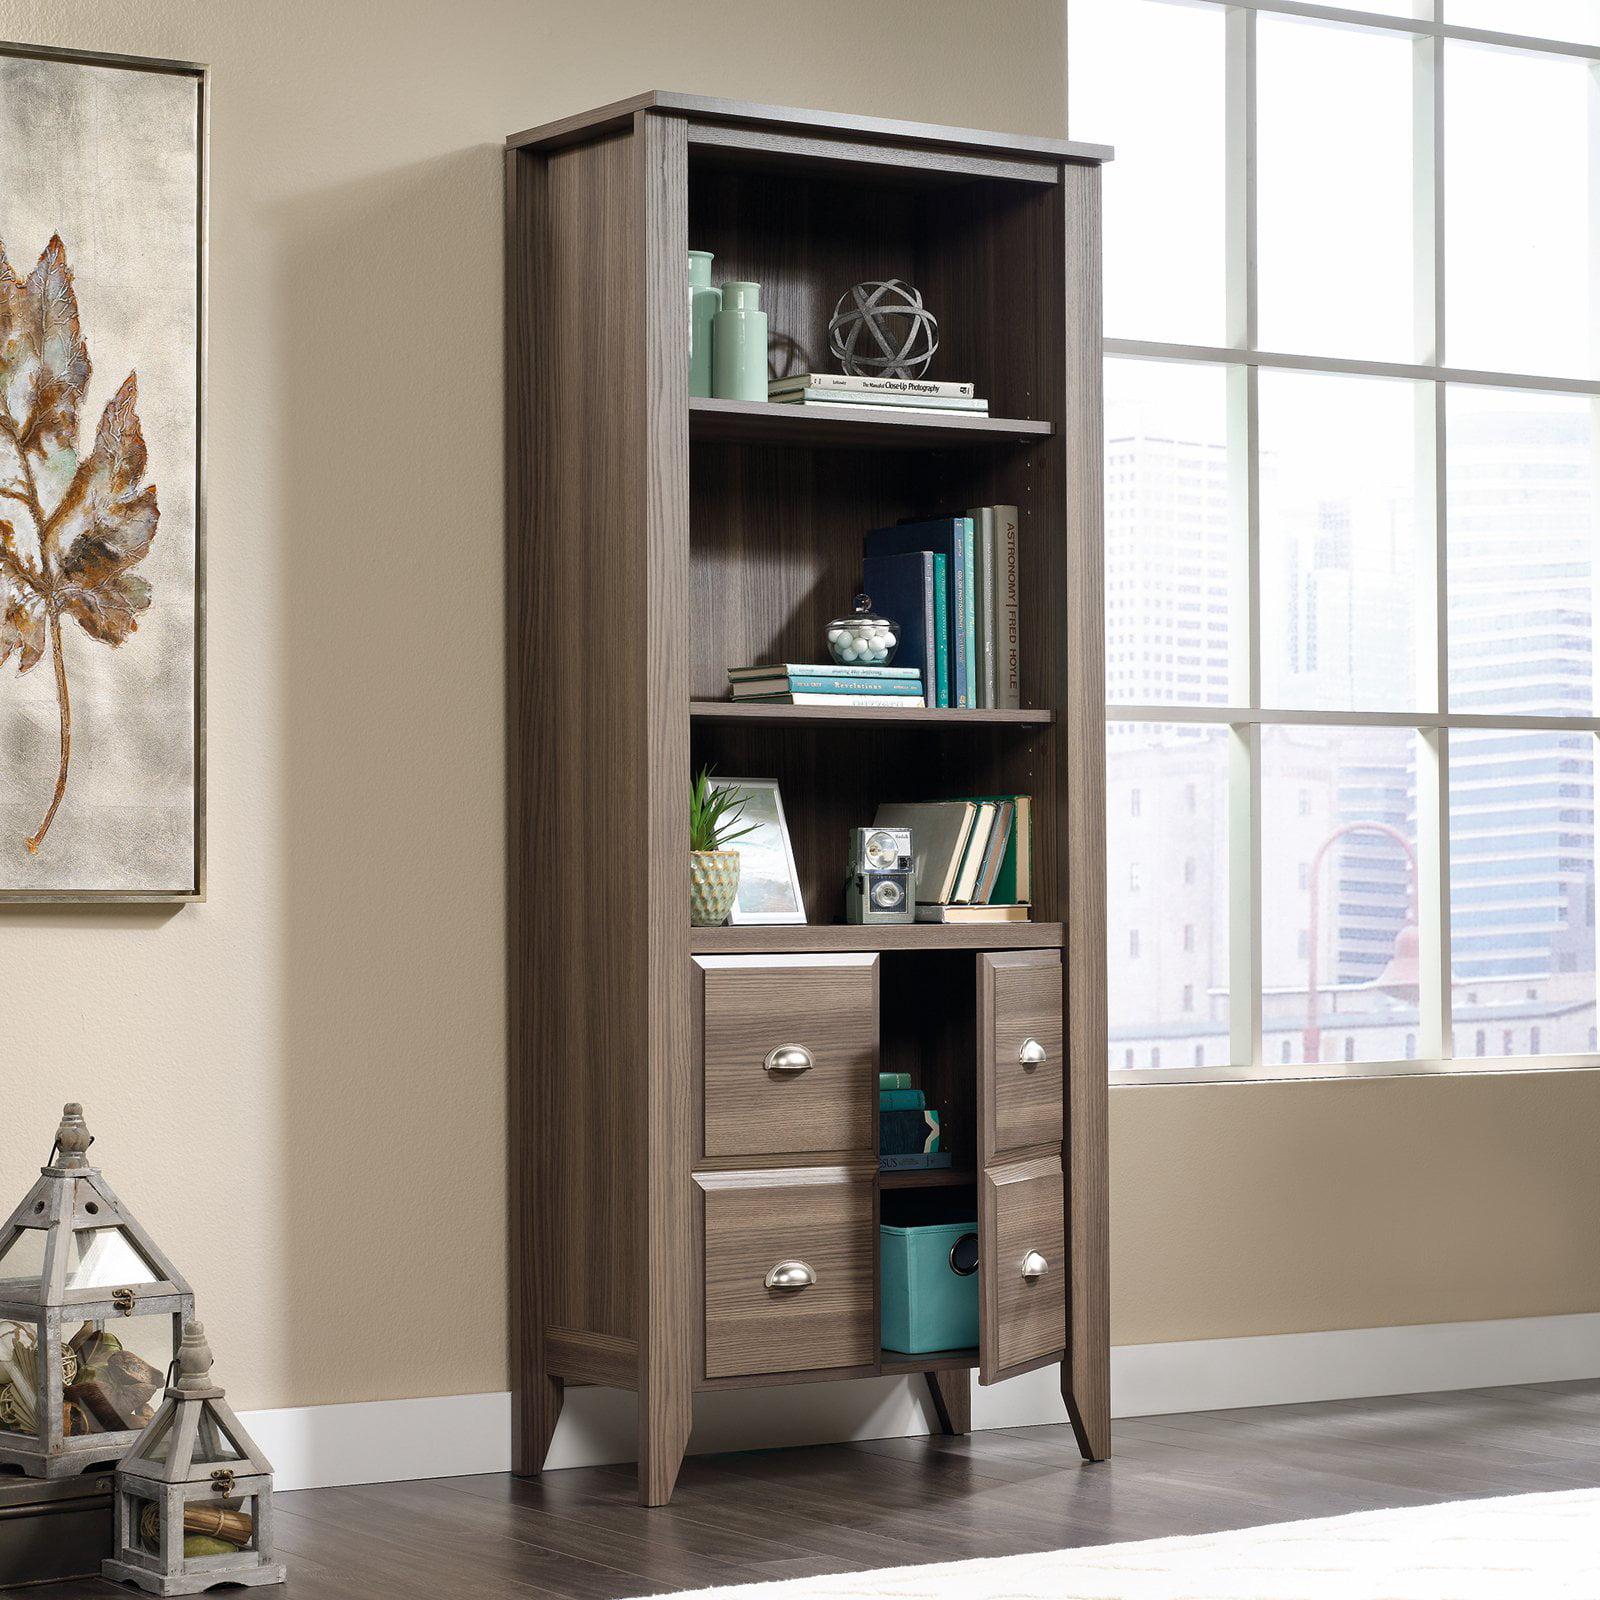 3 Shelf Office Library Room Wood Bookcase Adjustable Shelves With Door  Storage